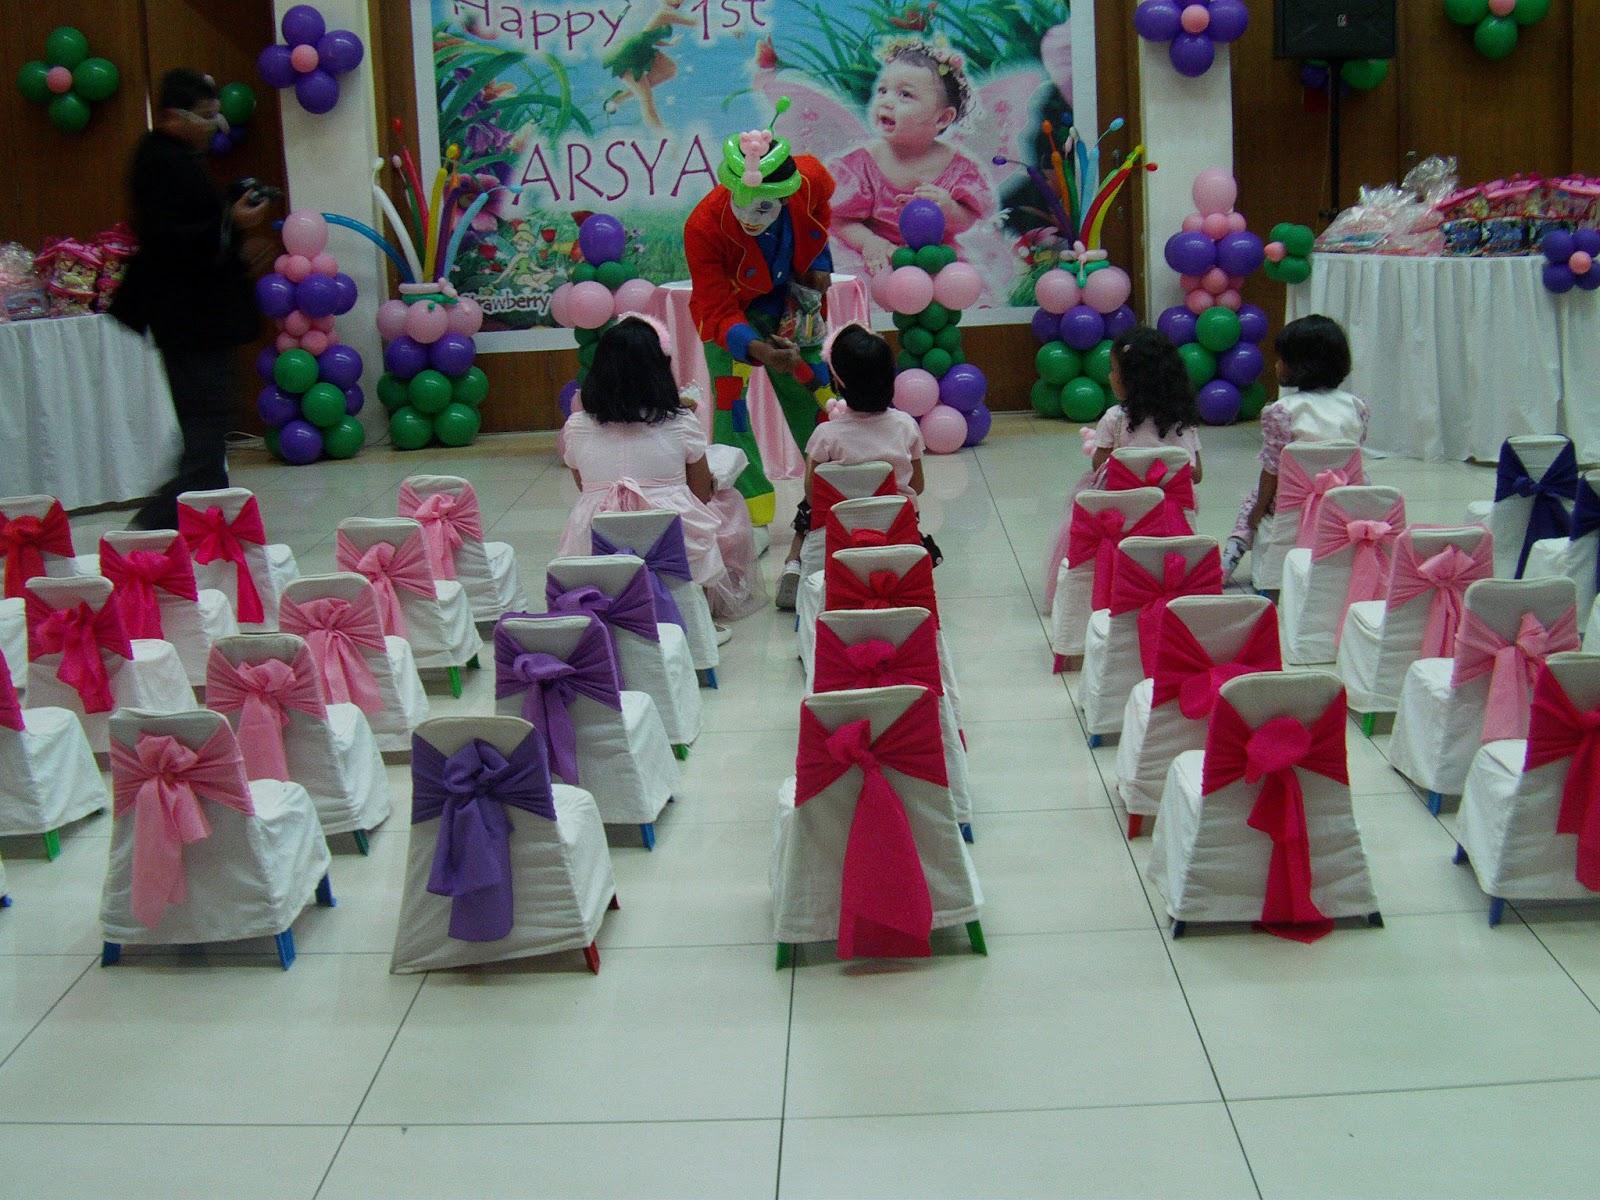 :event organizer properti ulang tahun , say board , sewa kursi anak